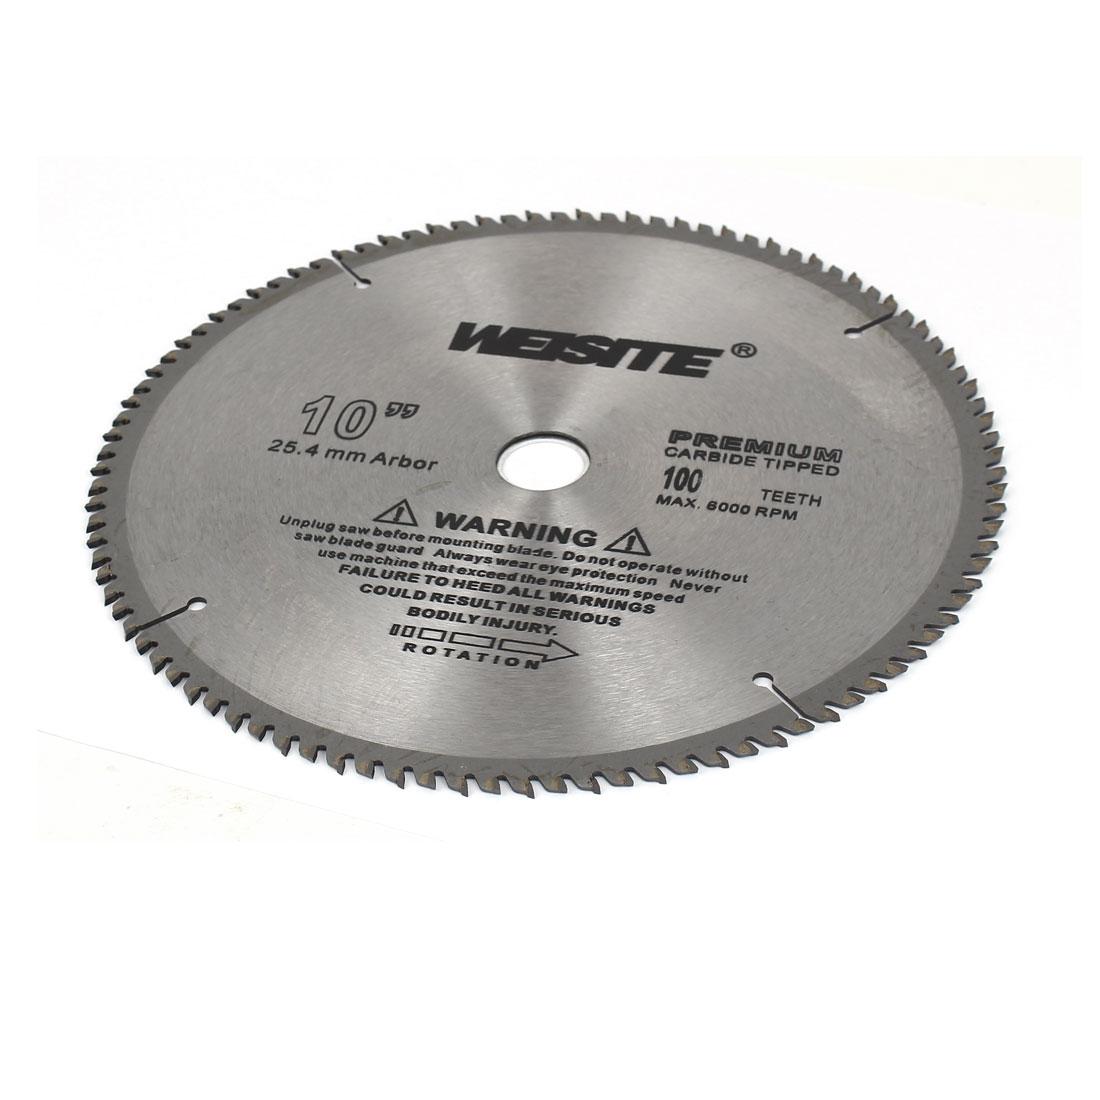 "Carbide Tipped Circular Saw Cutter Tool 10"" Diameter 100T Teeth Silver Gray"